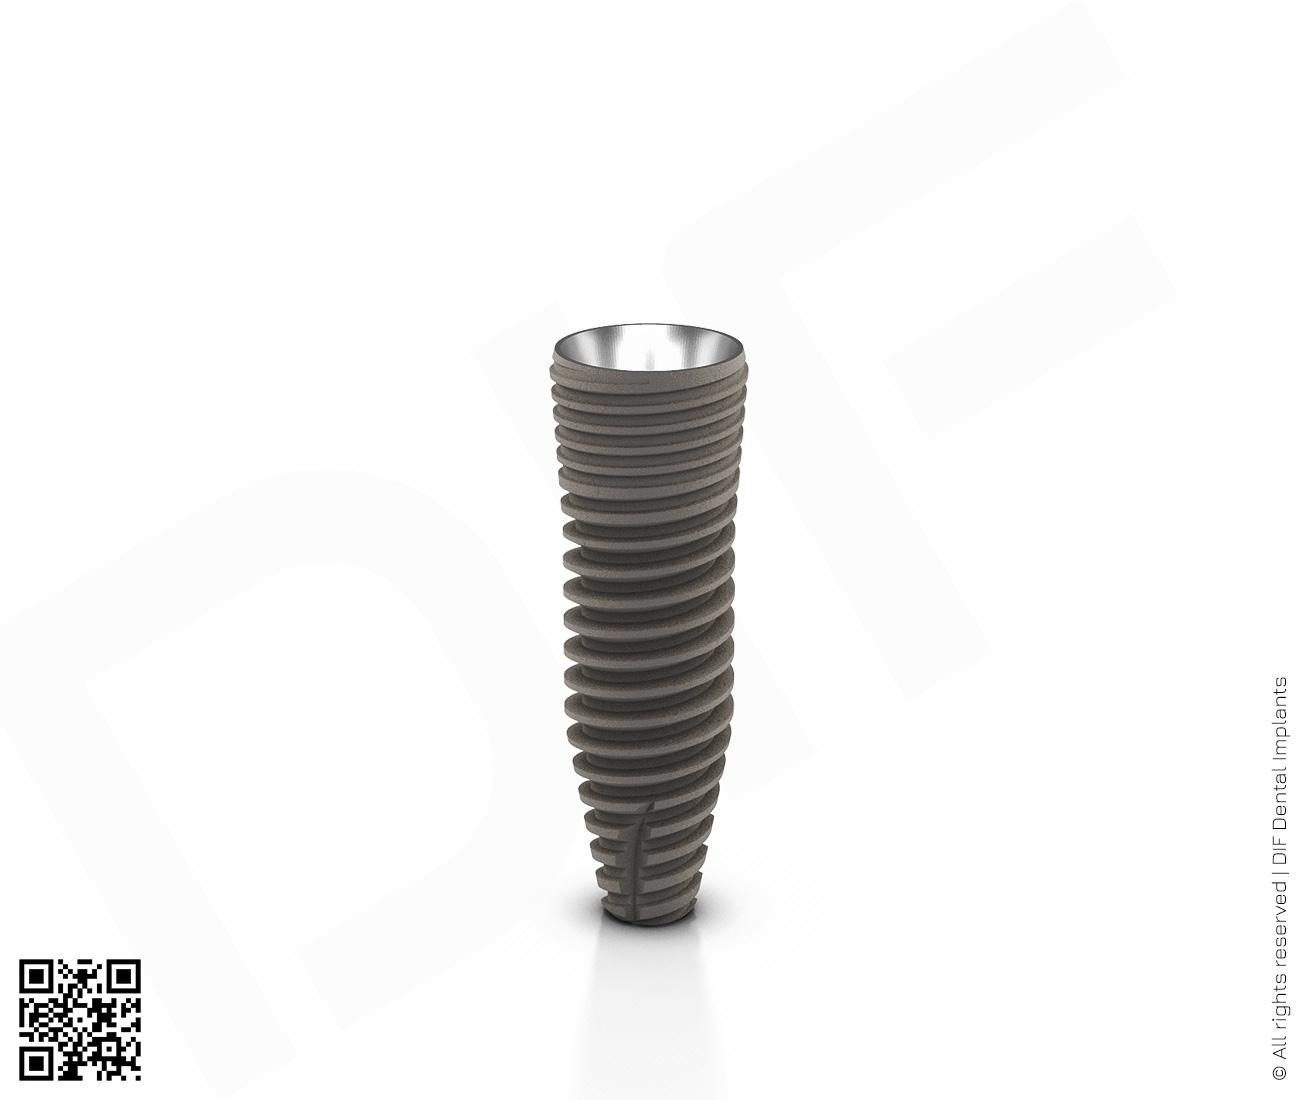 Фото имплантат mainstream fine d3.75 мм – l11.5 мм  производства DIF.